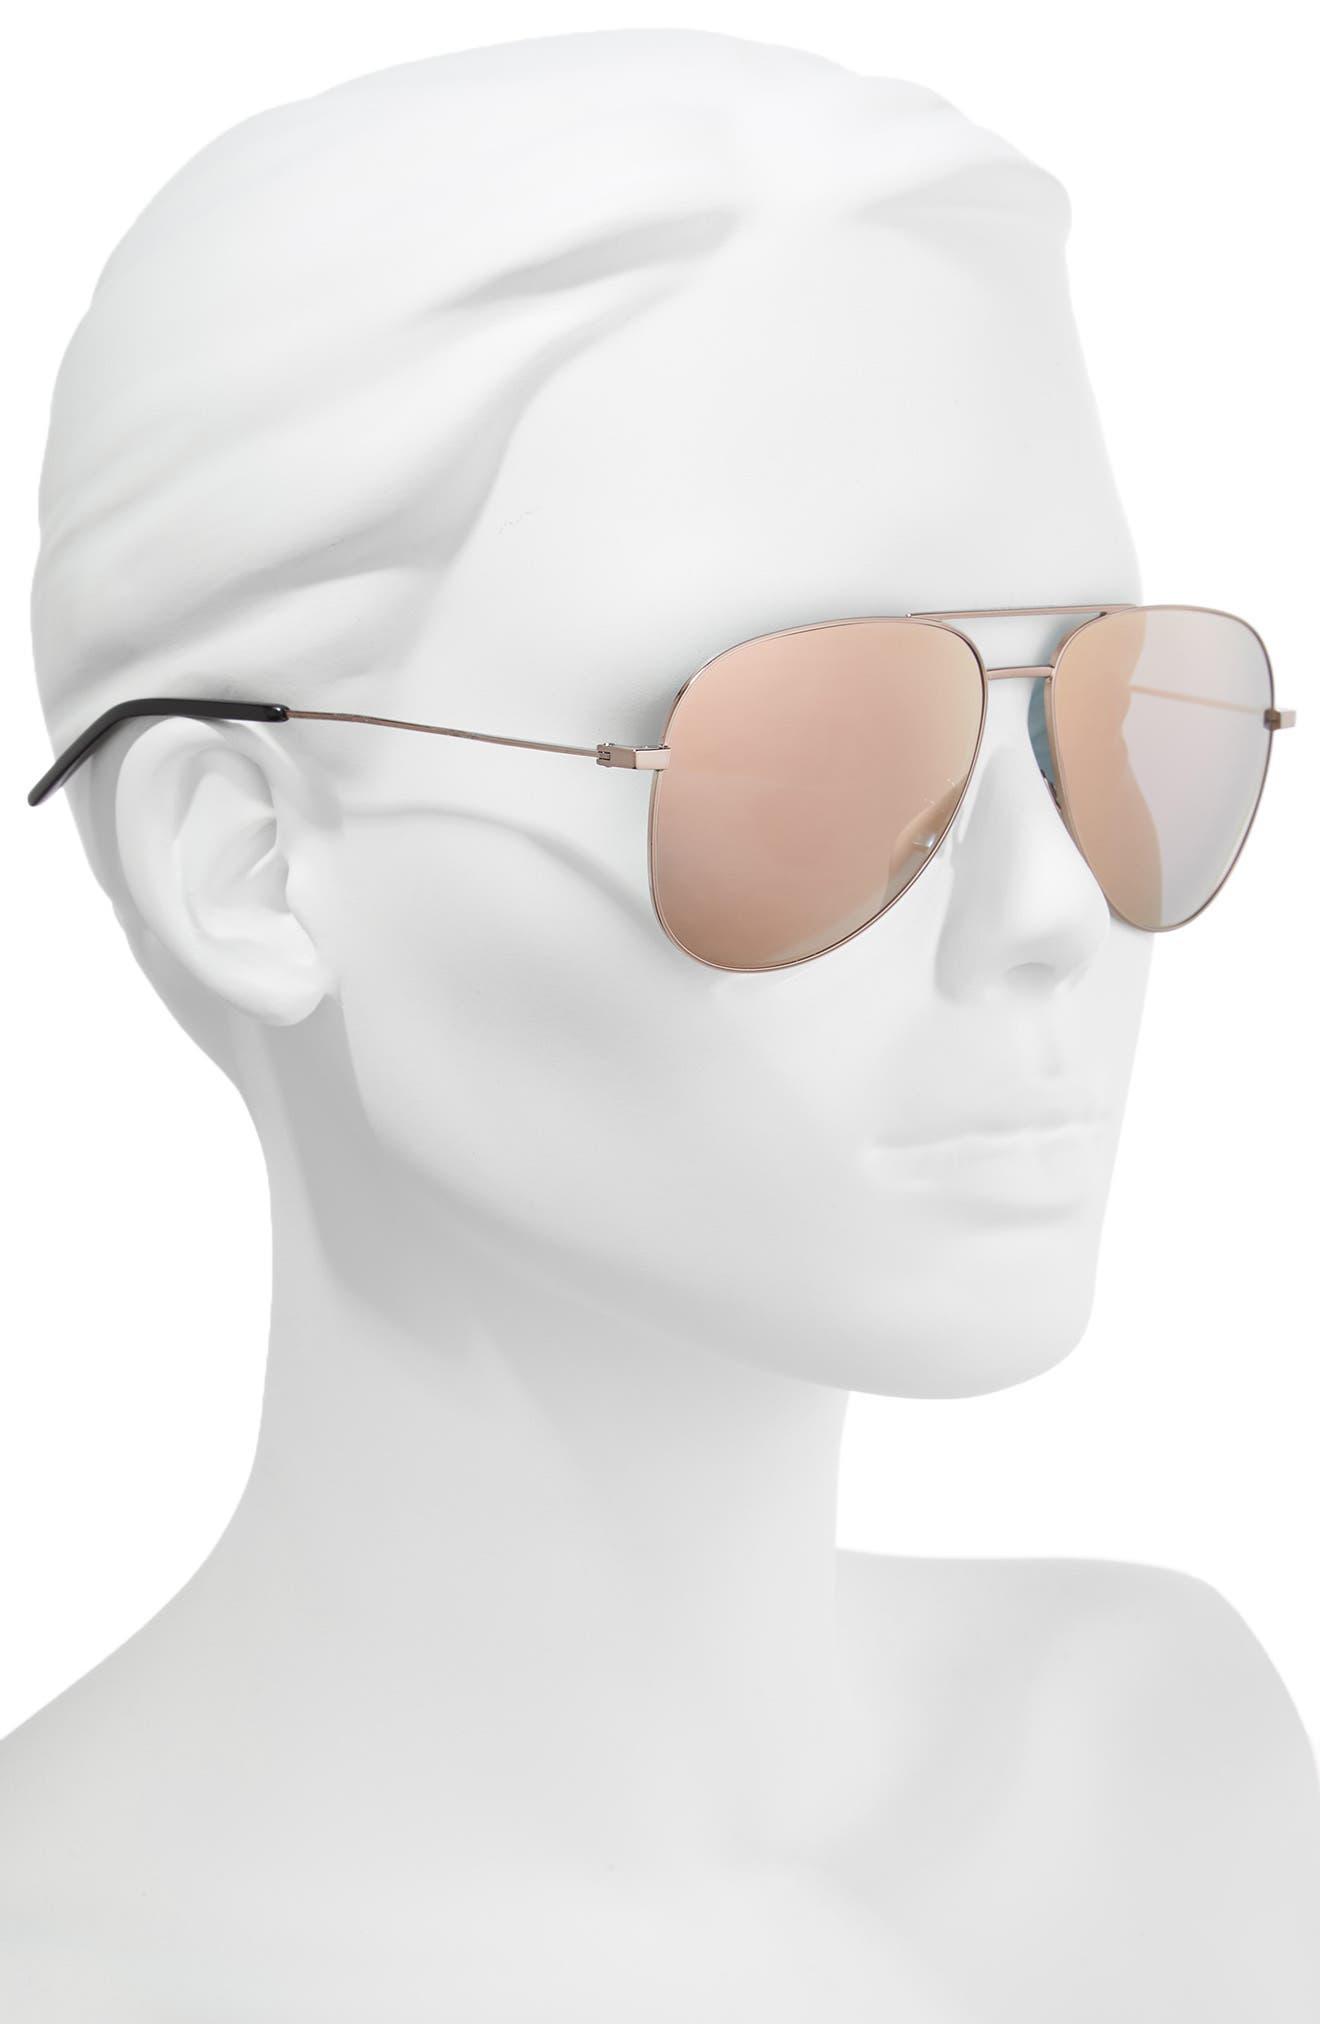 59mm Brow Bar Aviator Sunglasses,                             Alternate thumbnail 2, color,                             250